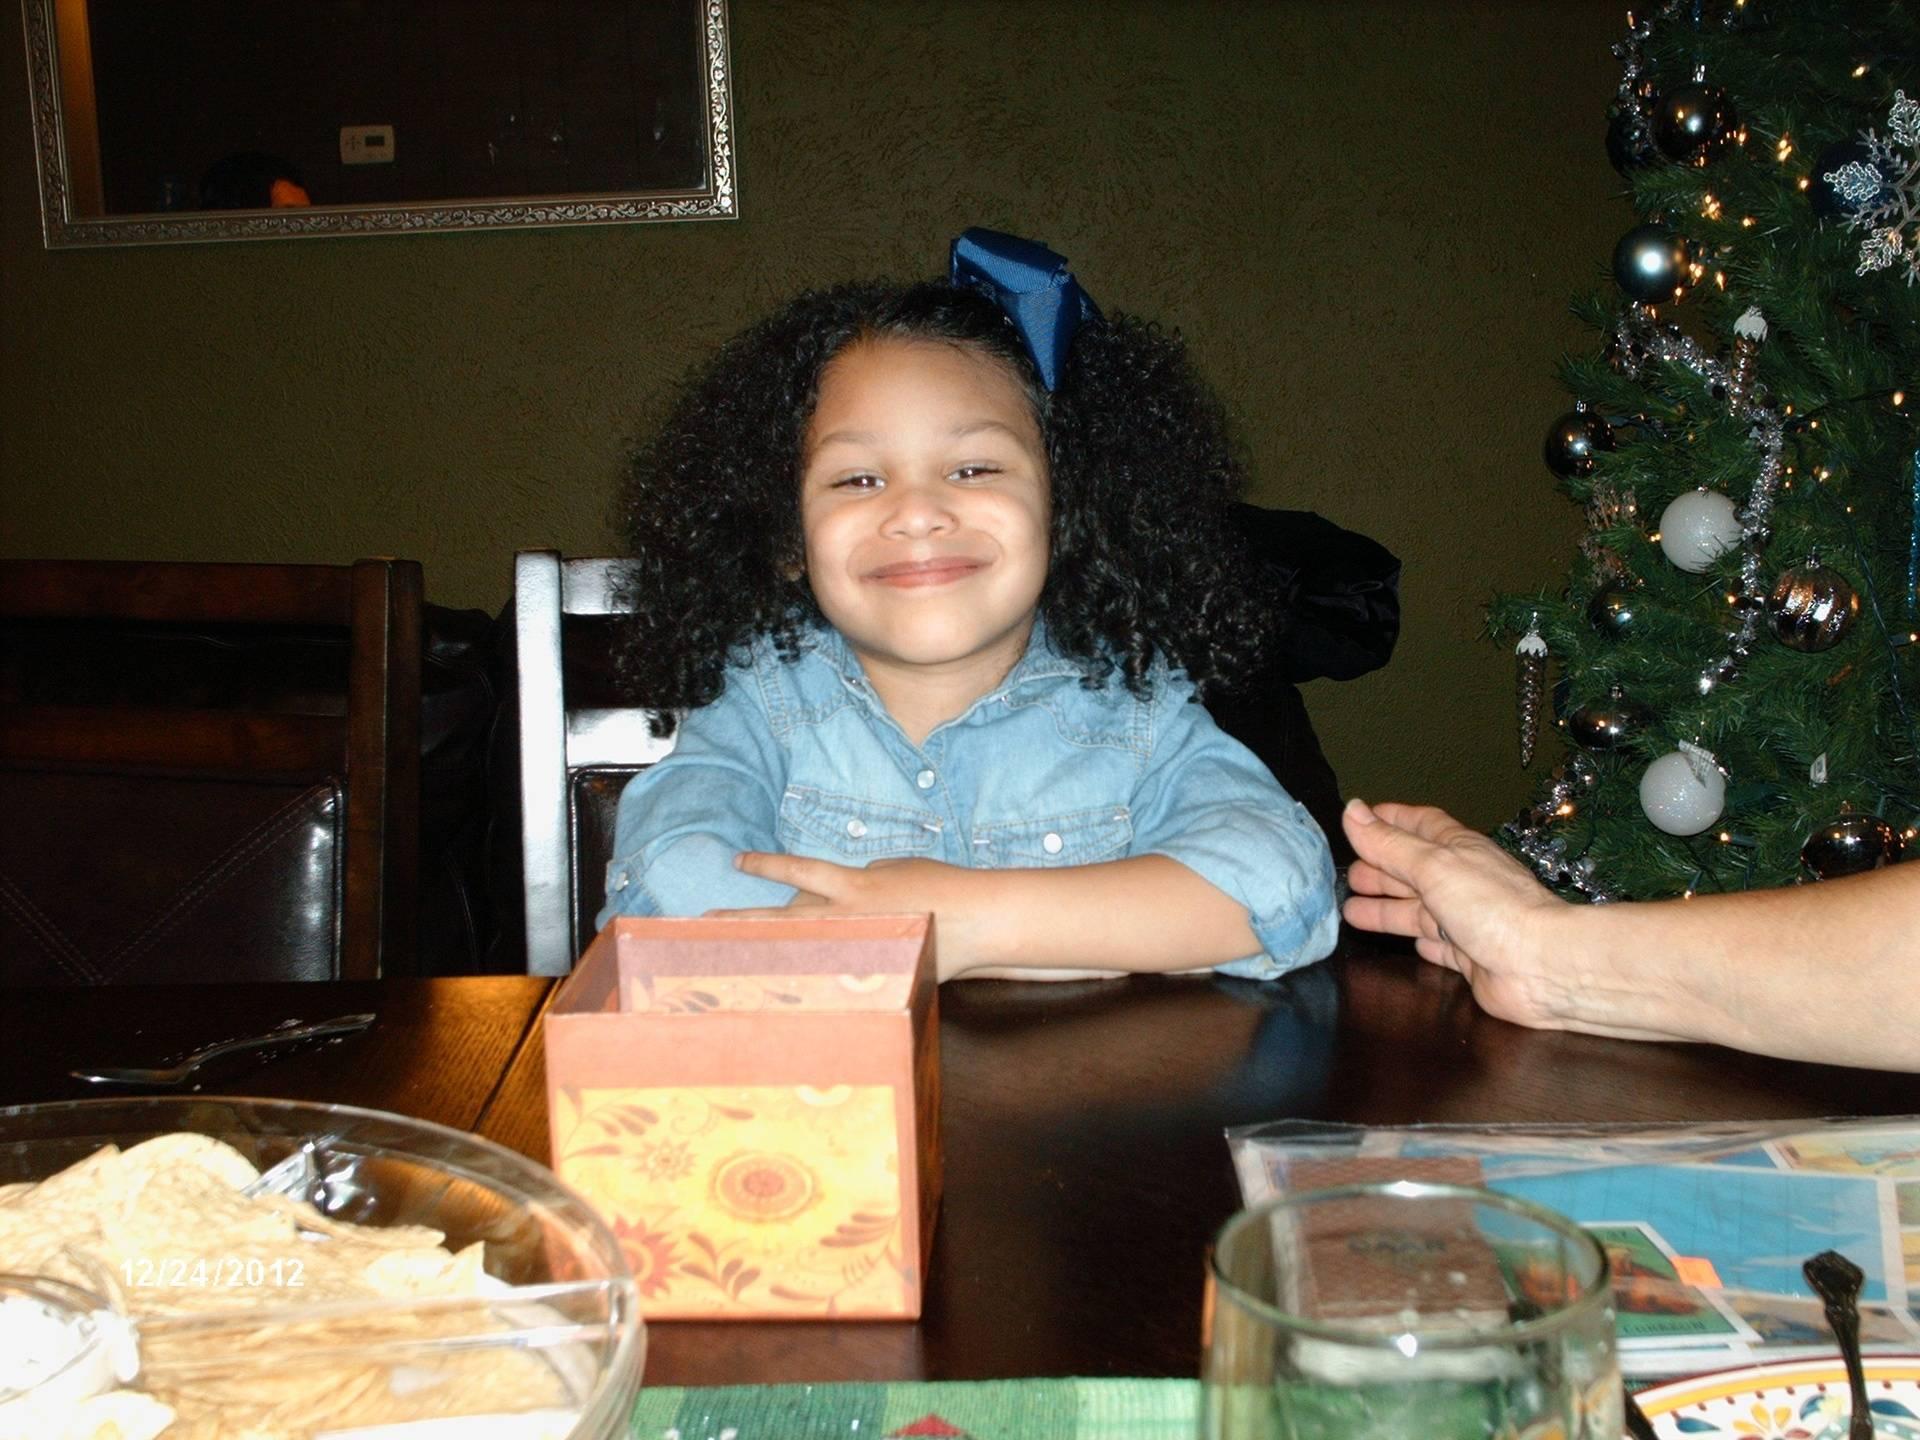 My Great Grandaughter Maiya